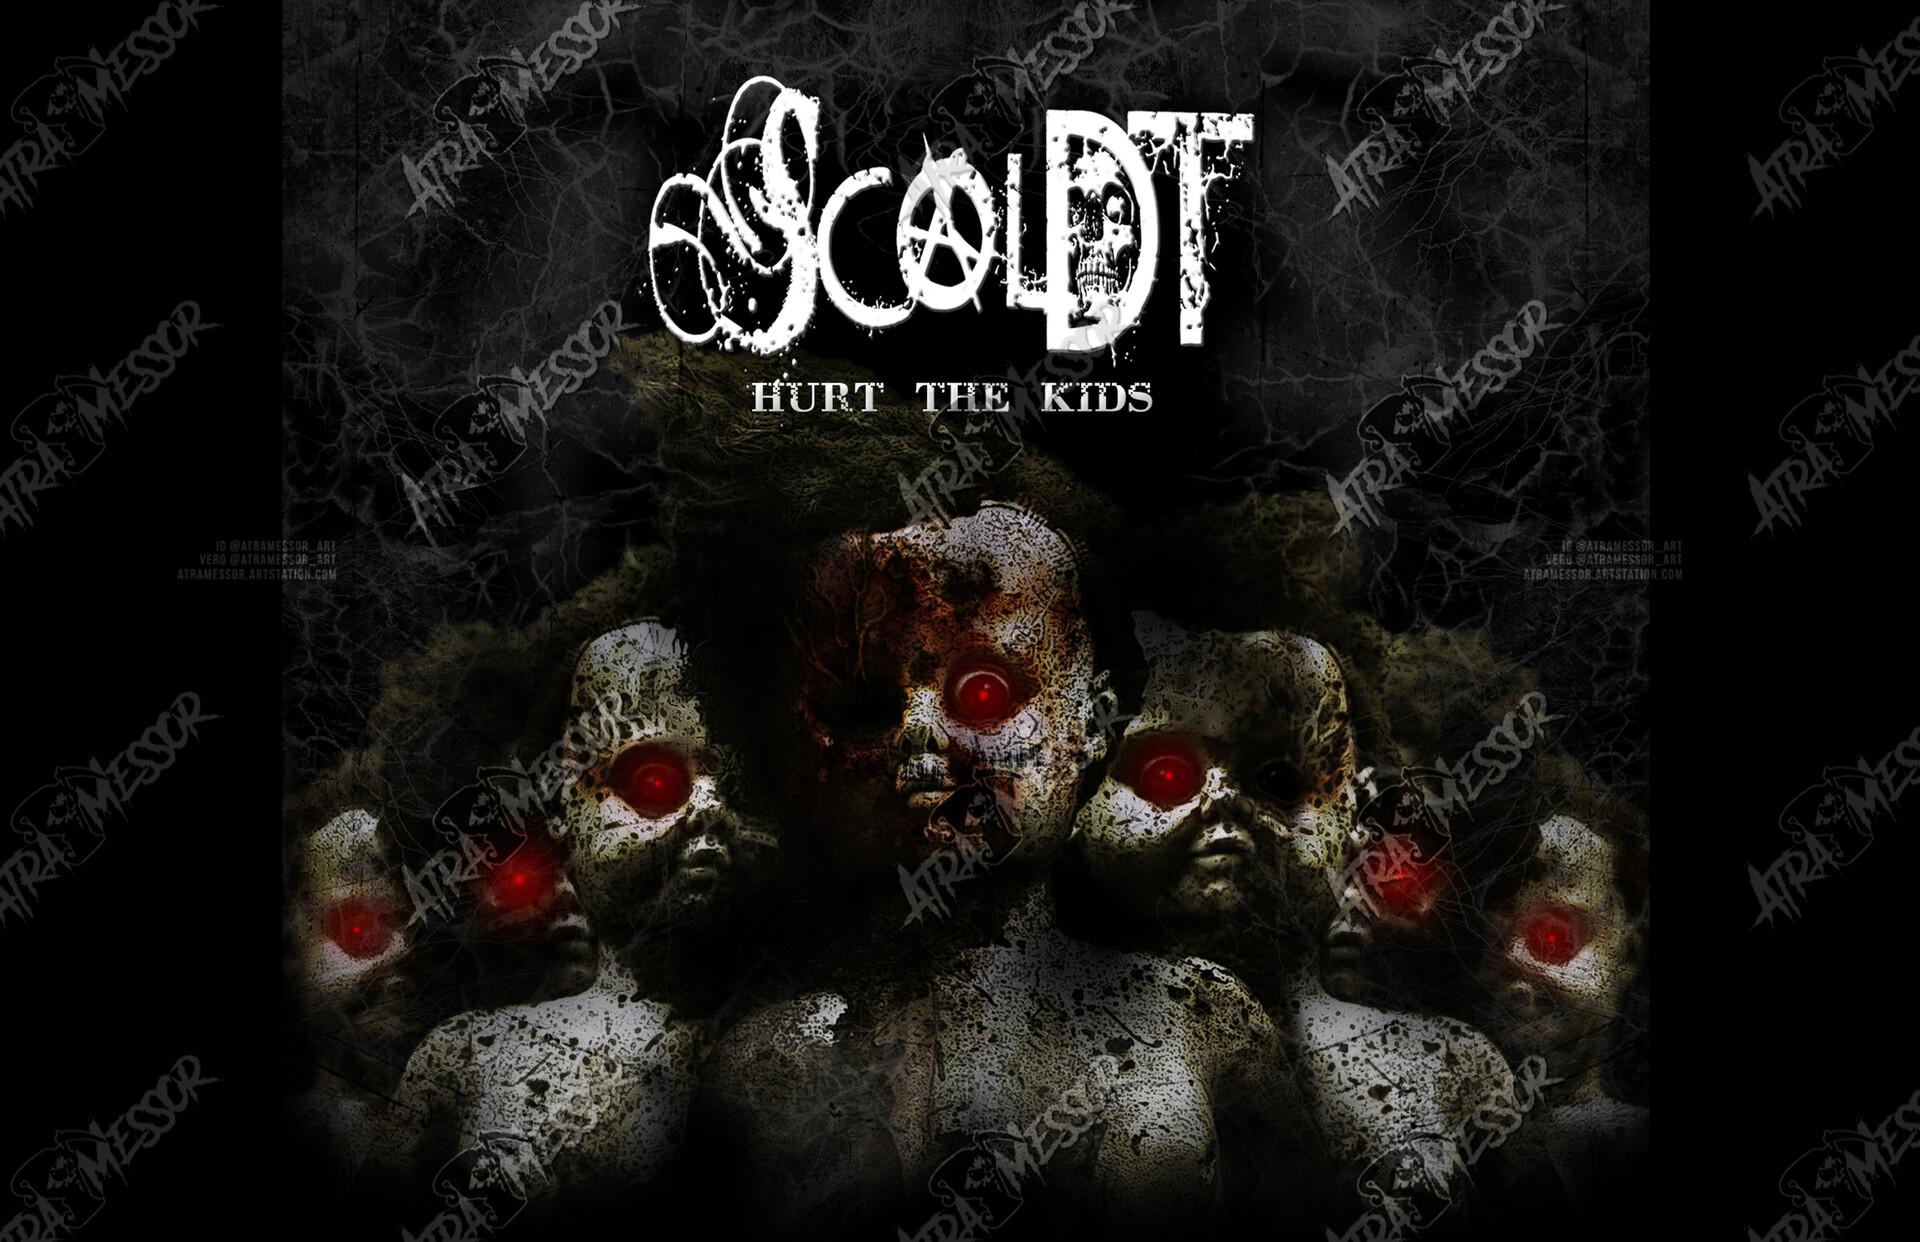 Scoldt Hurt the Kids Album Art